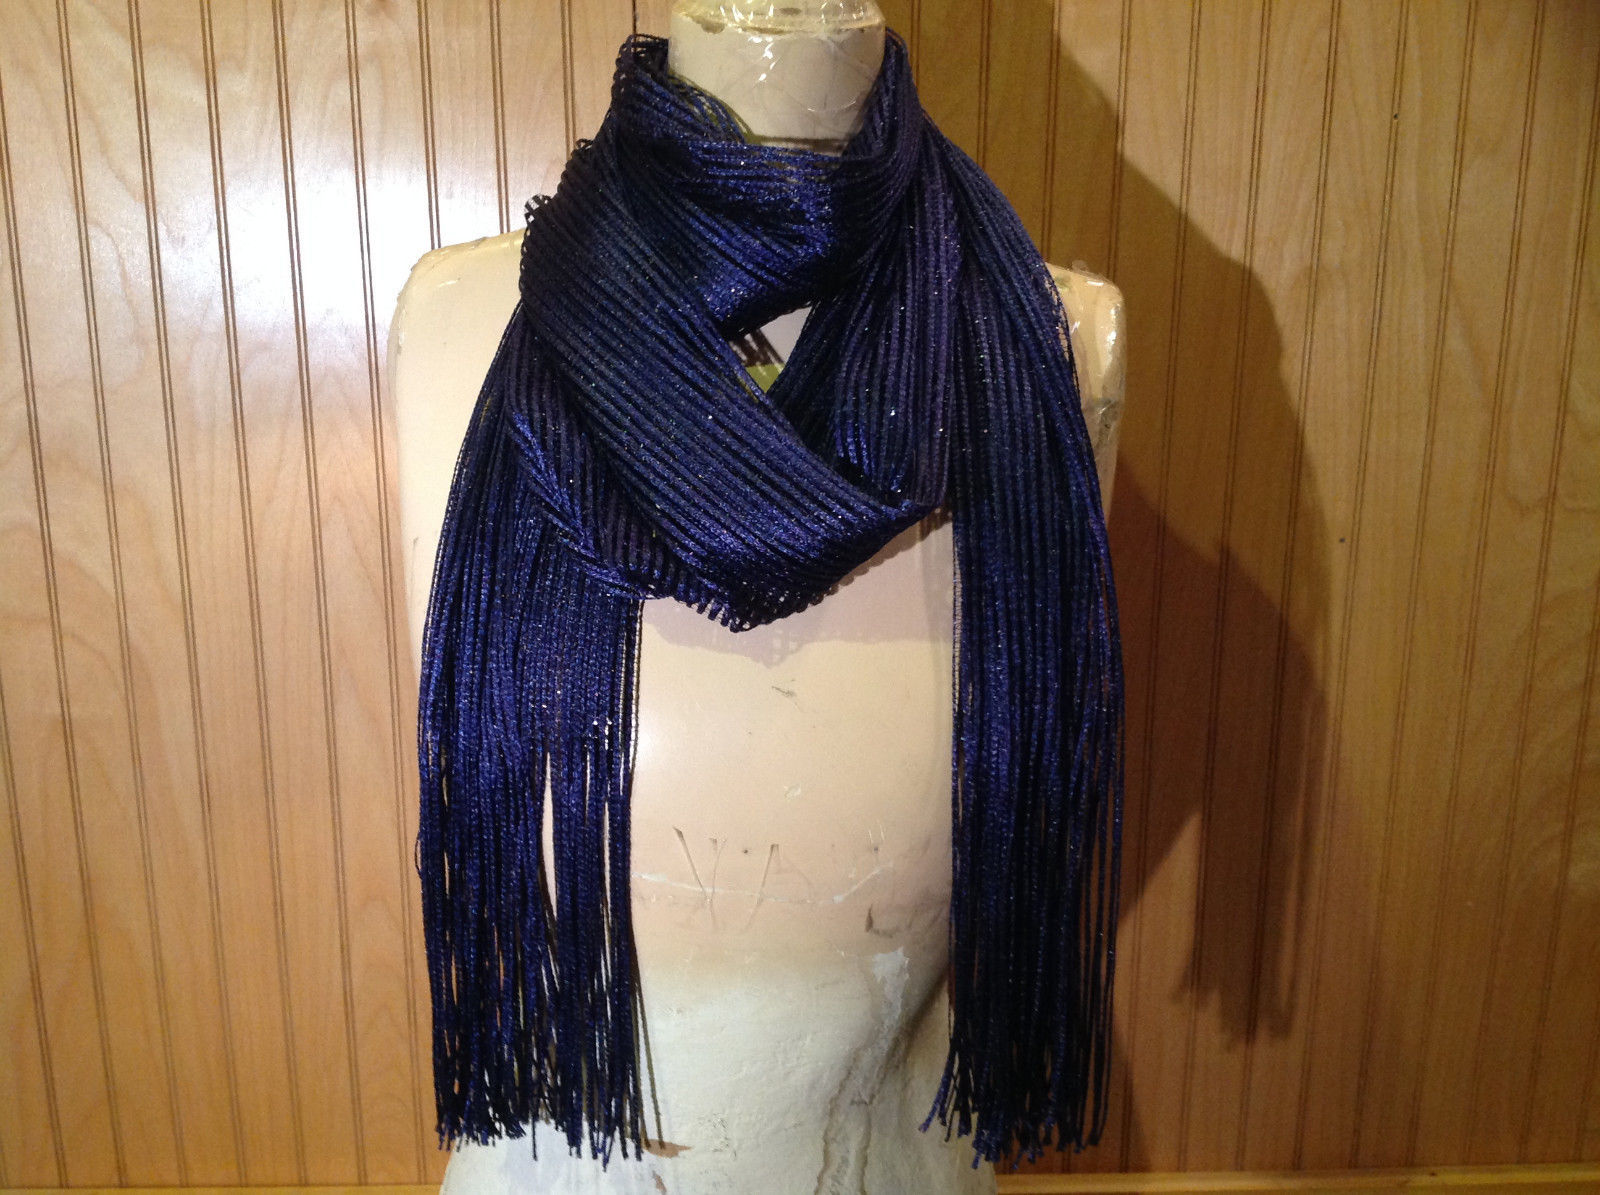 Dark Blue Metallic Shine Tasseled Fashion Scarf Sheer Light Weight Material